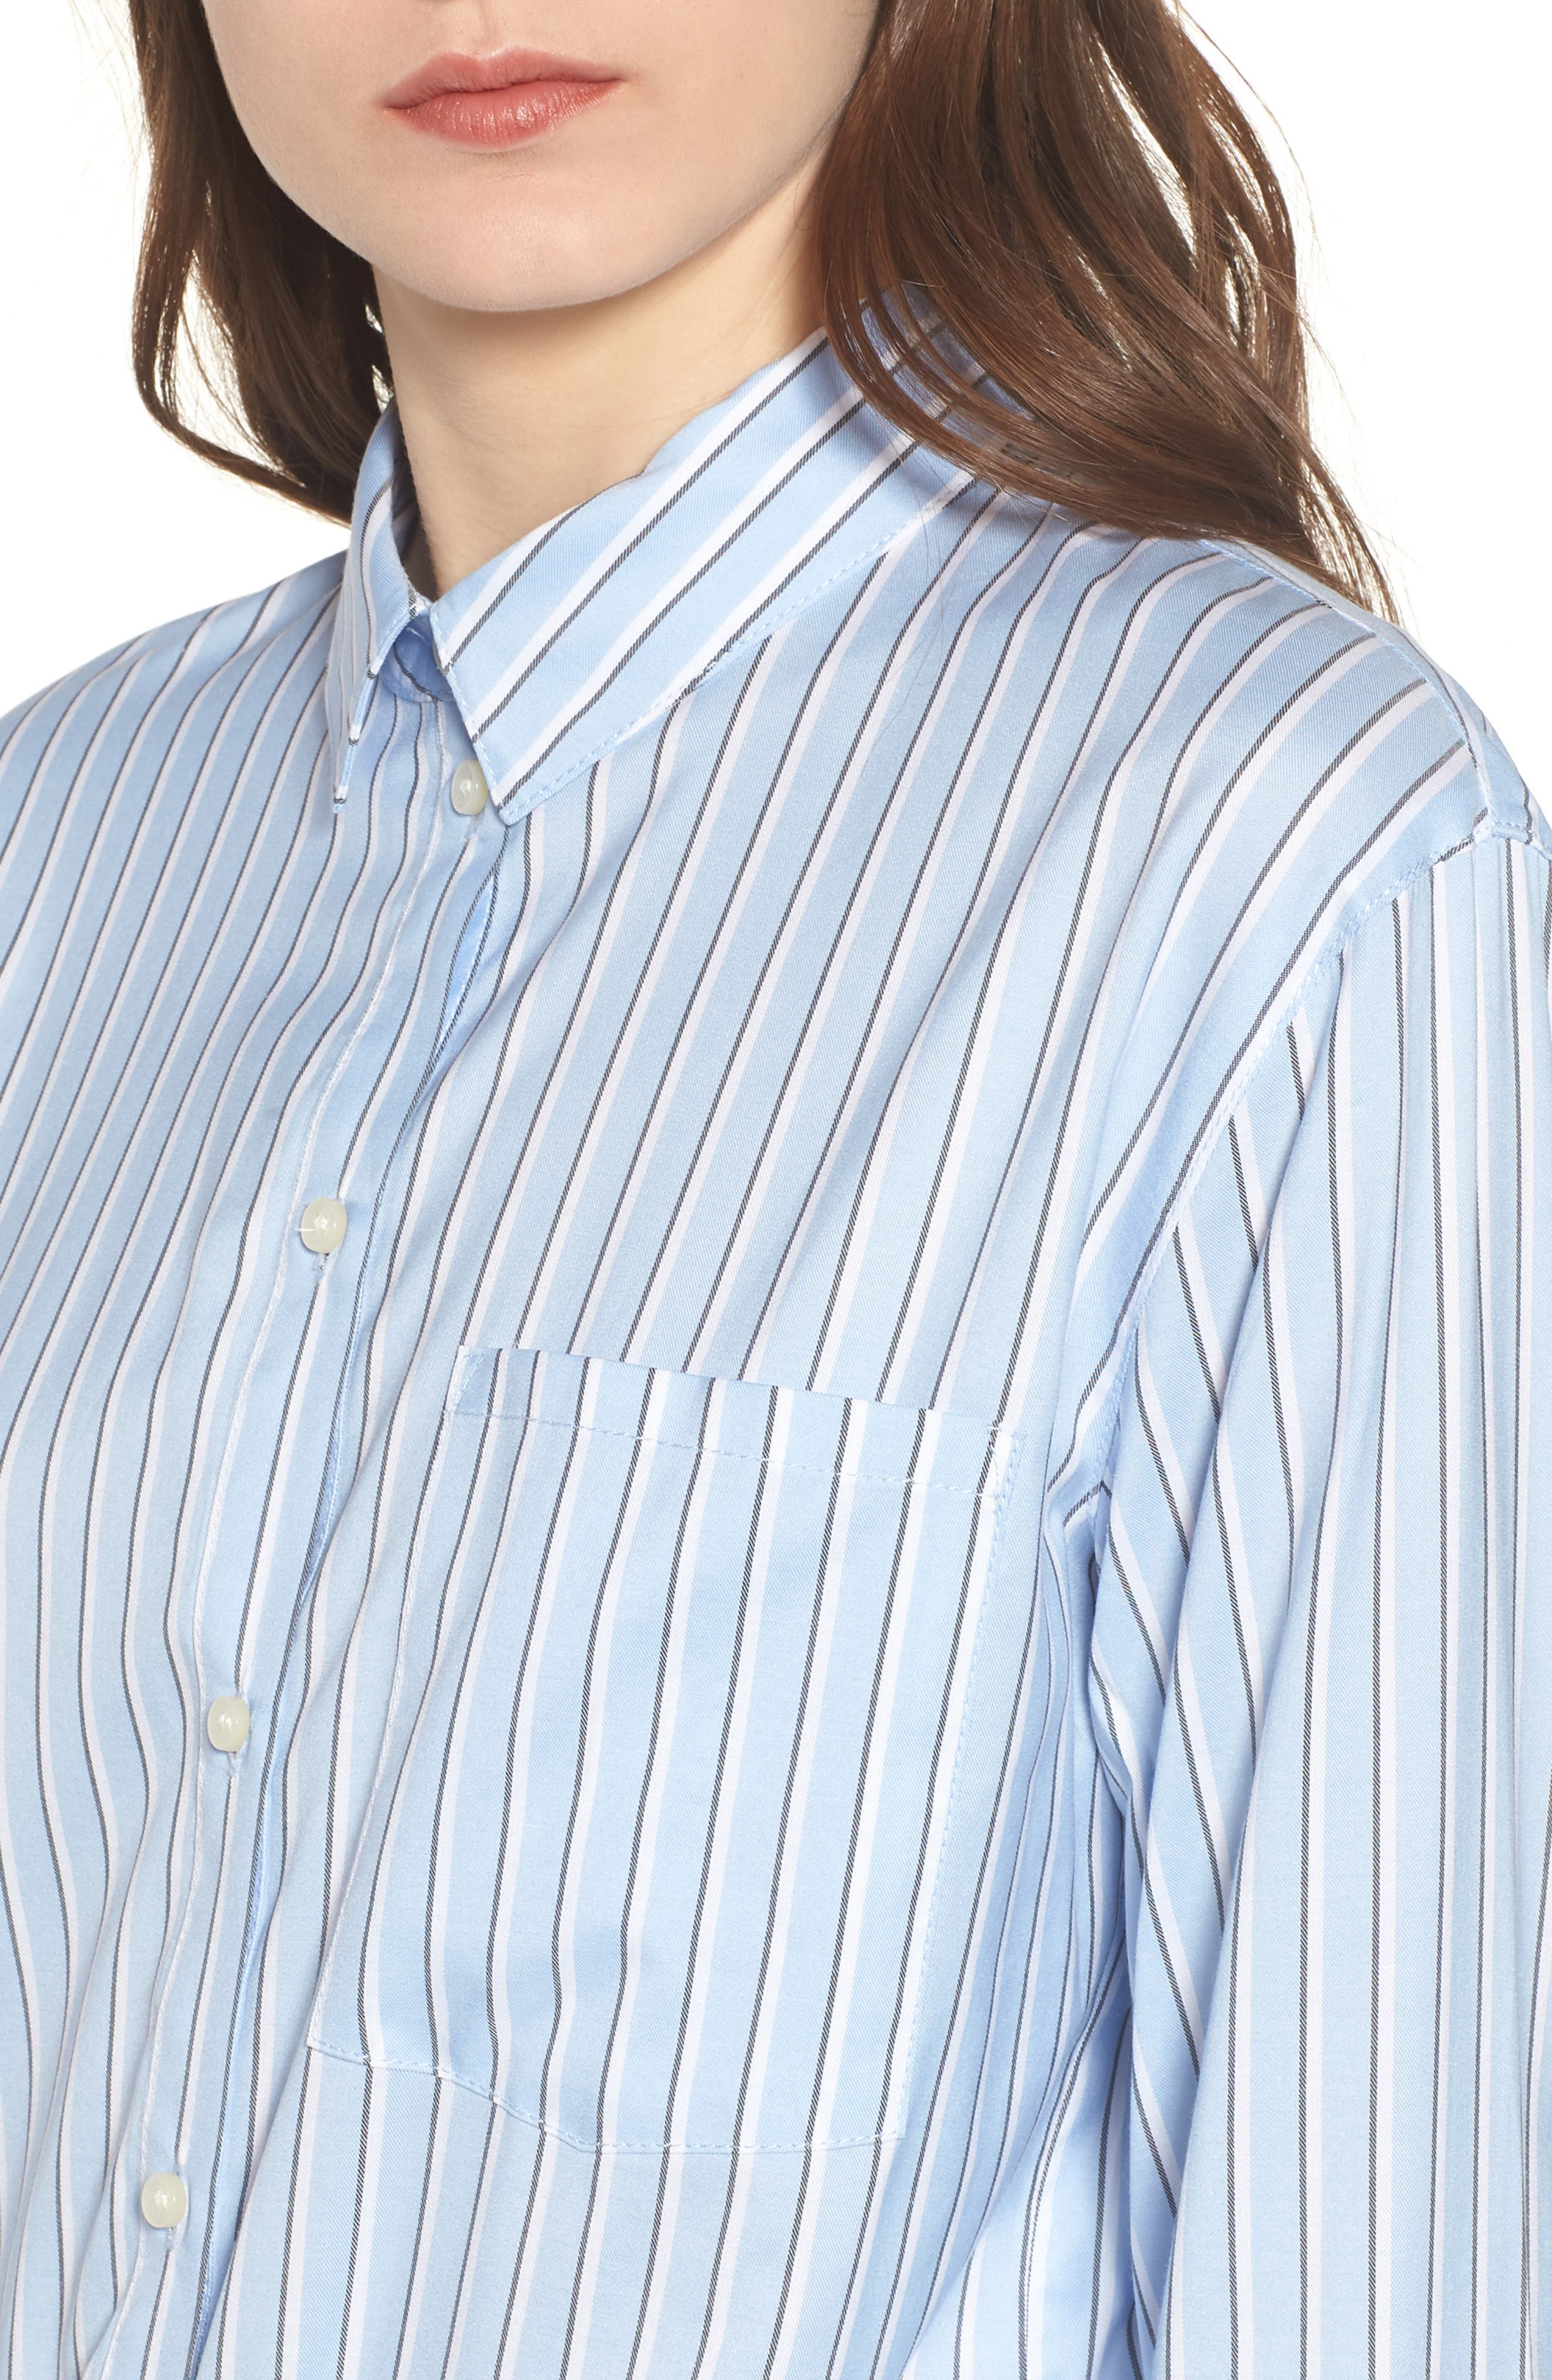 Stripe Button Front Shirt,                             Alternate thumbnail 4, color,                             Blue Brunnera Groove Stripe